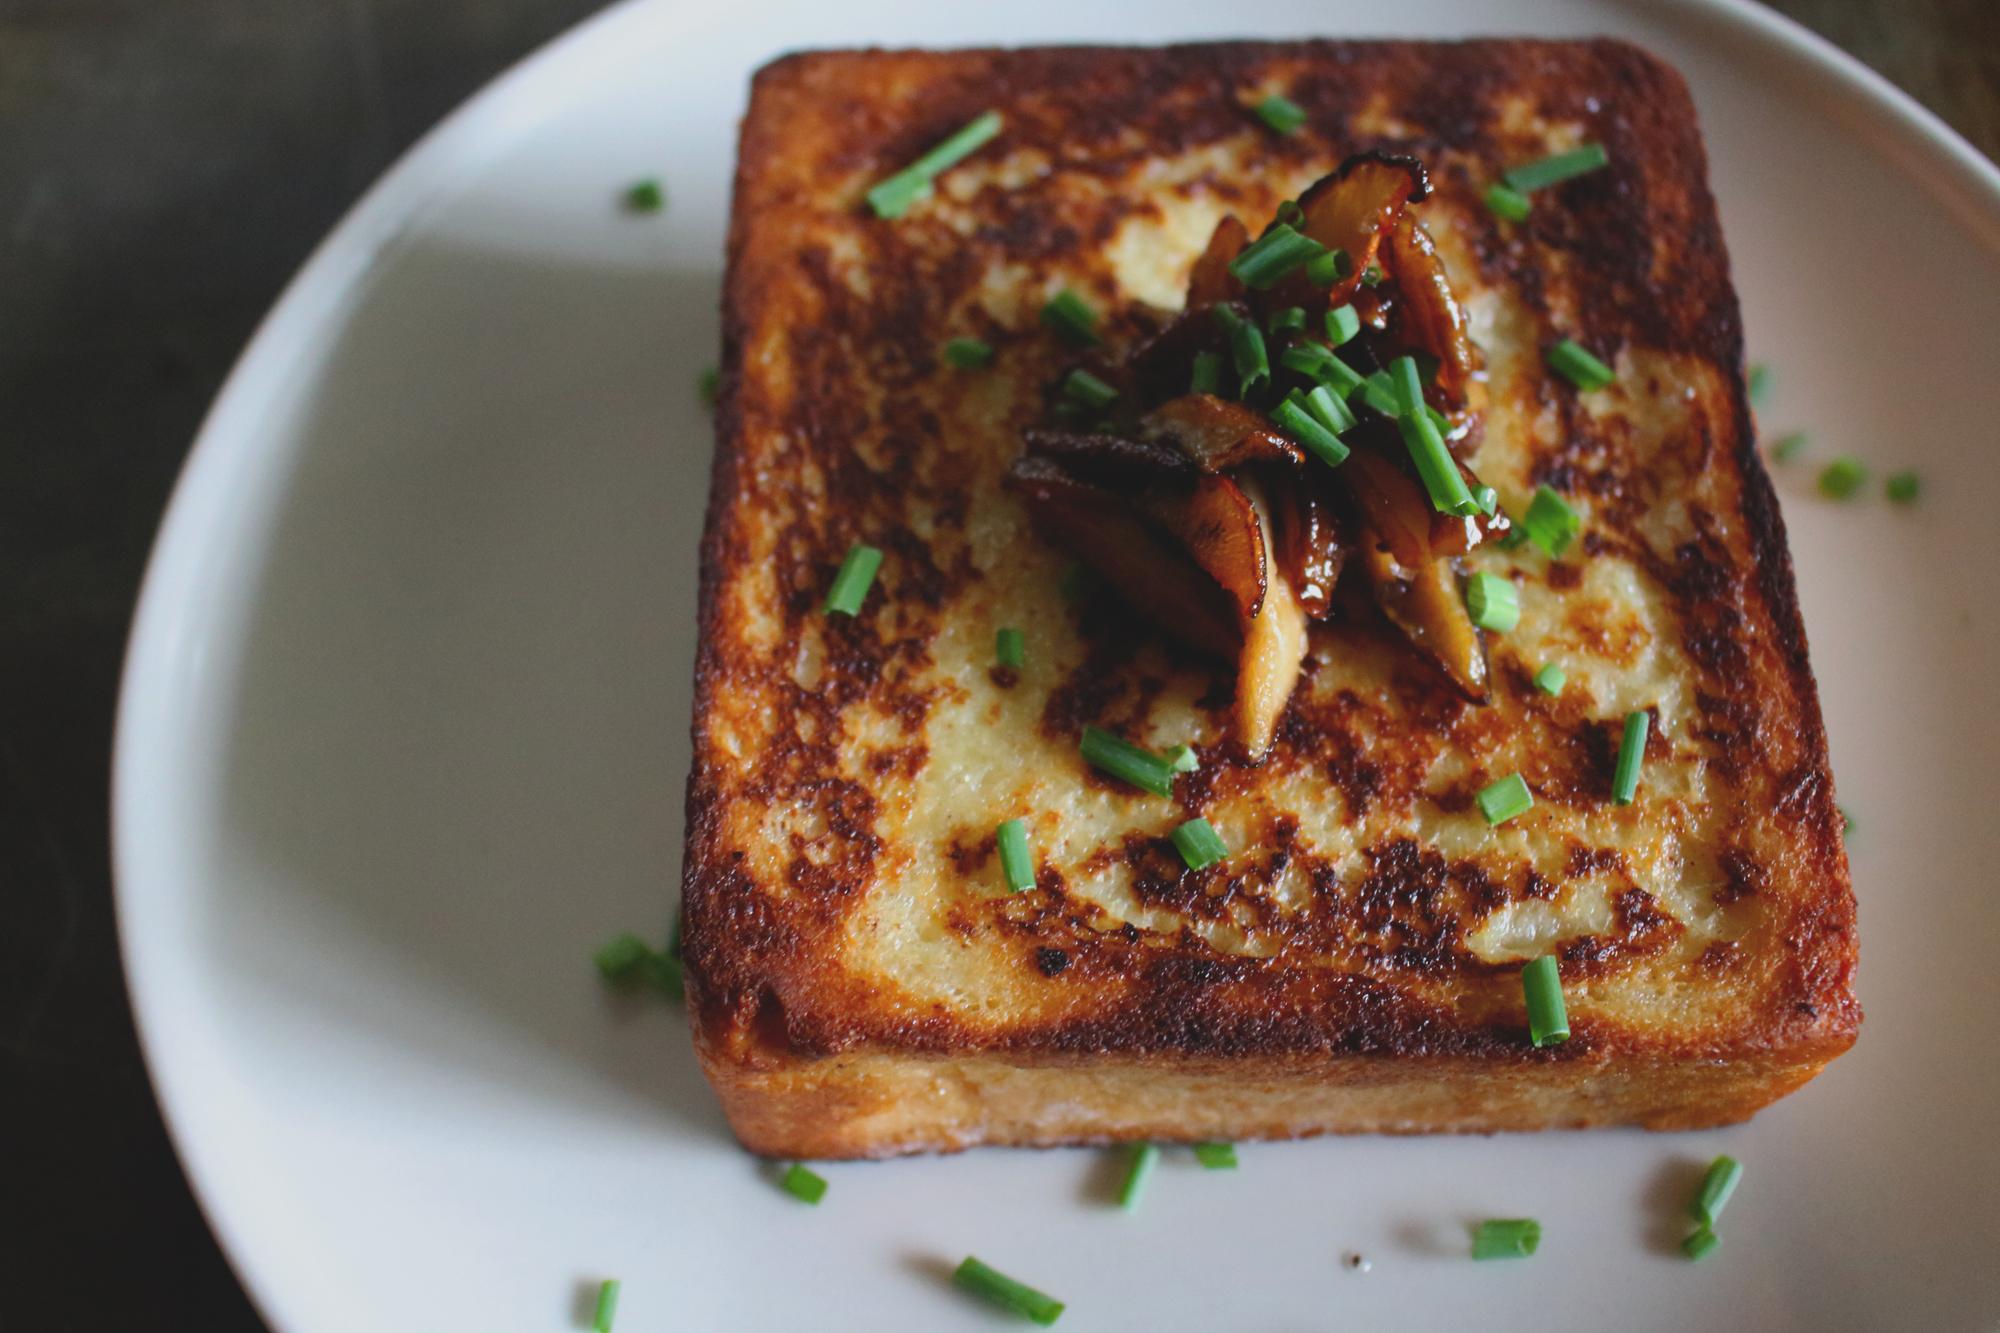 Shiitake Mushroom Stuffed French Toast